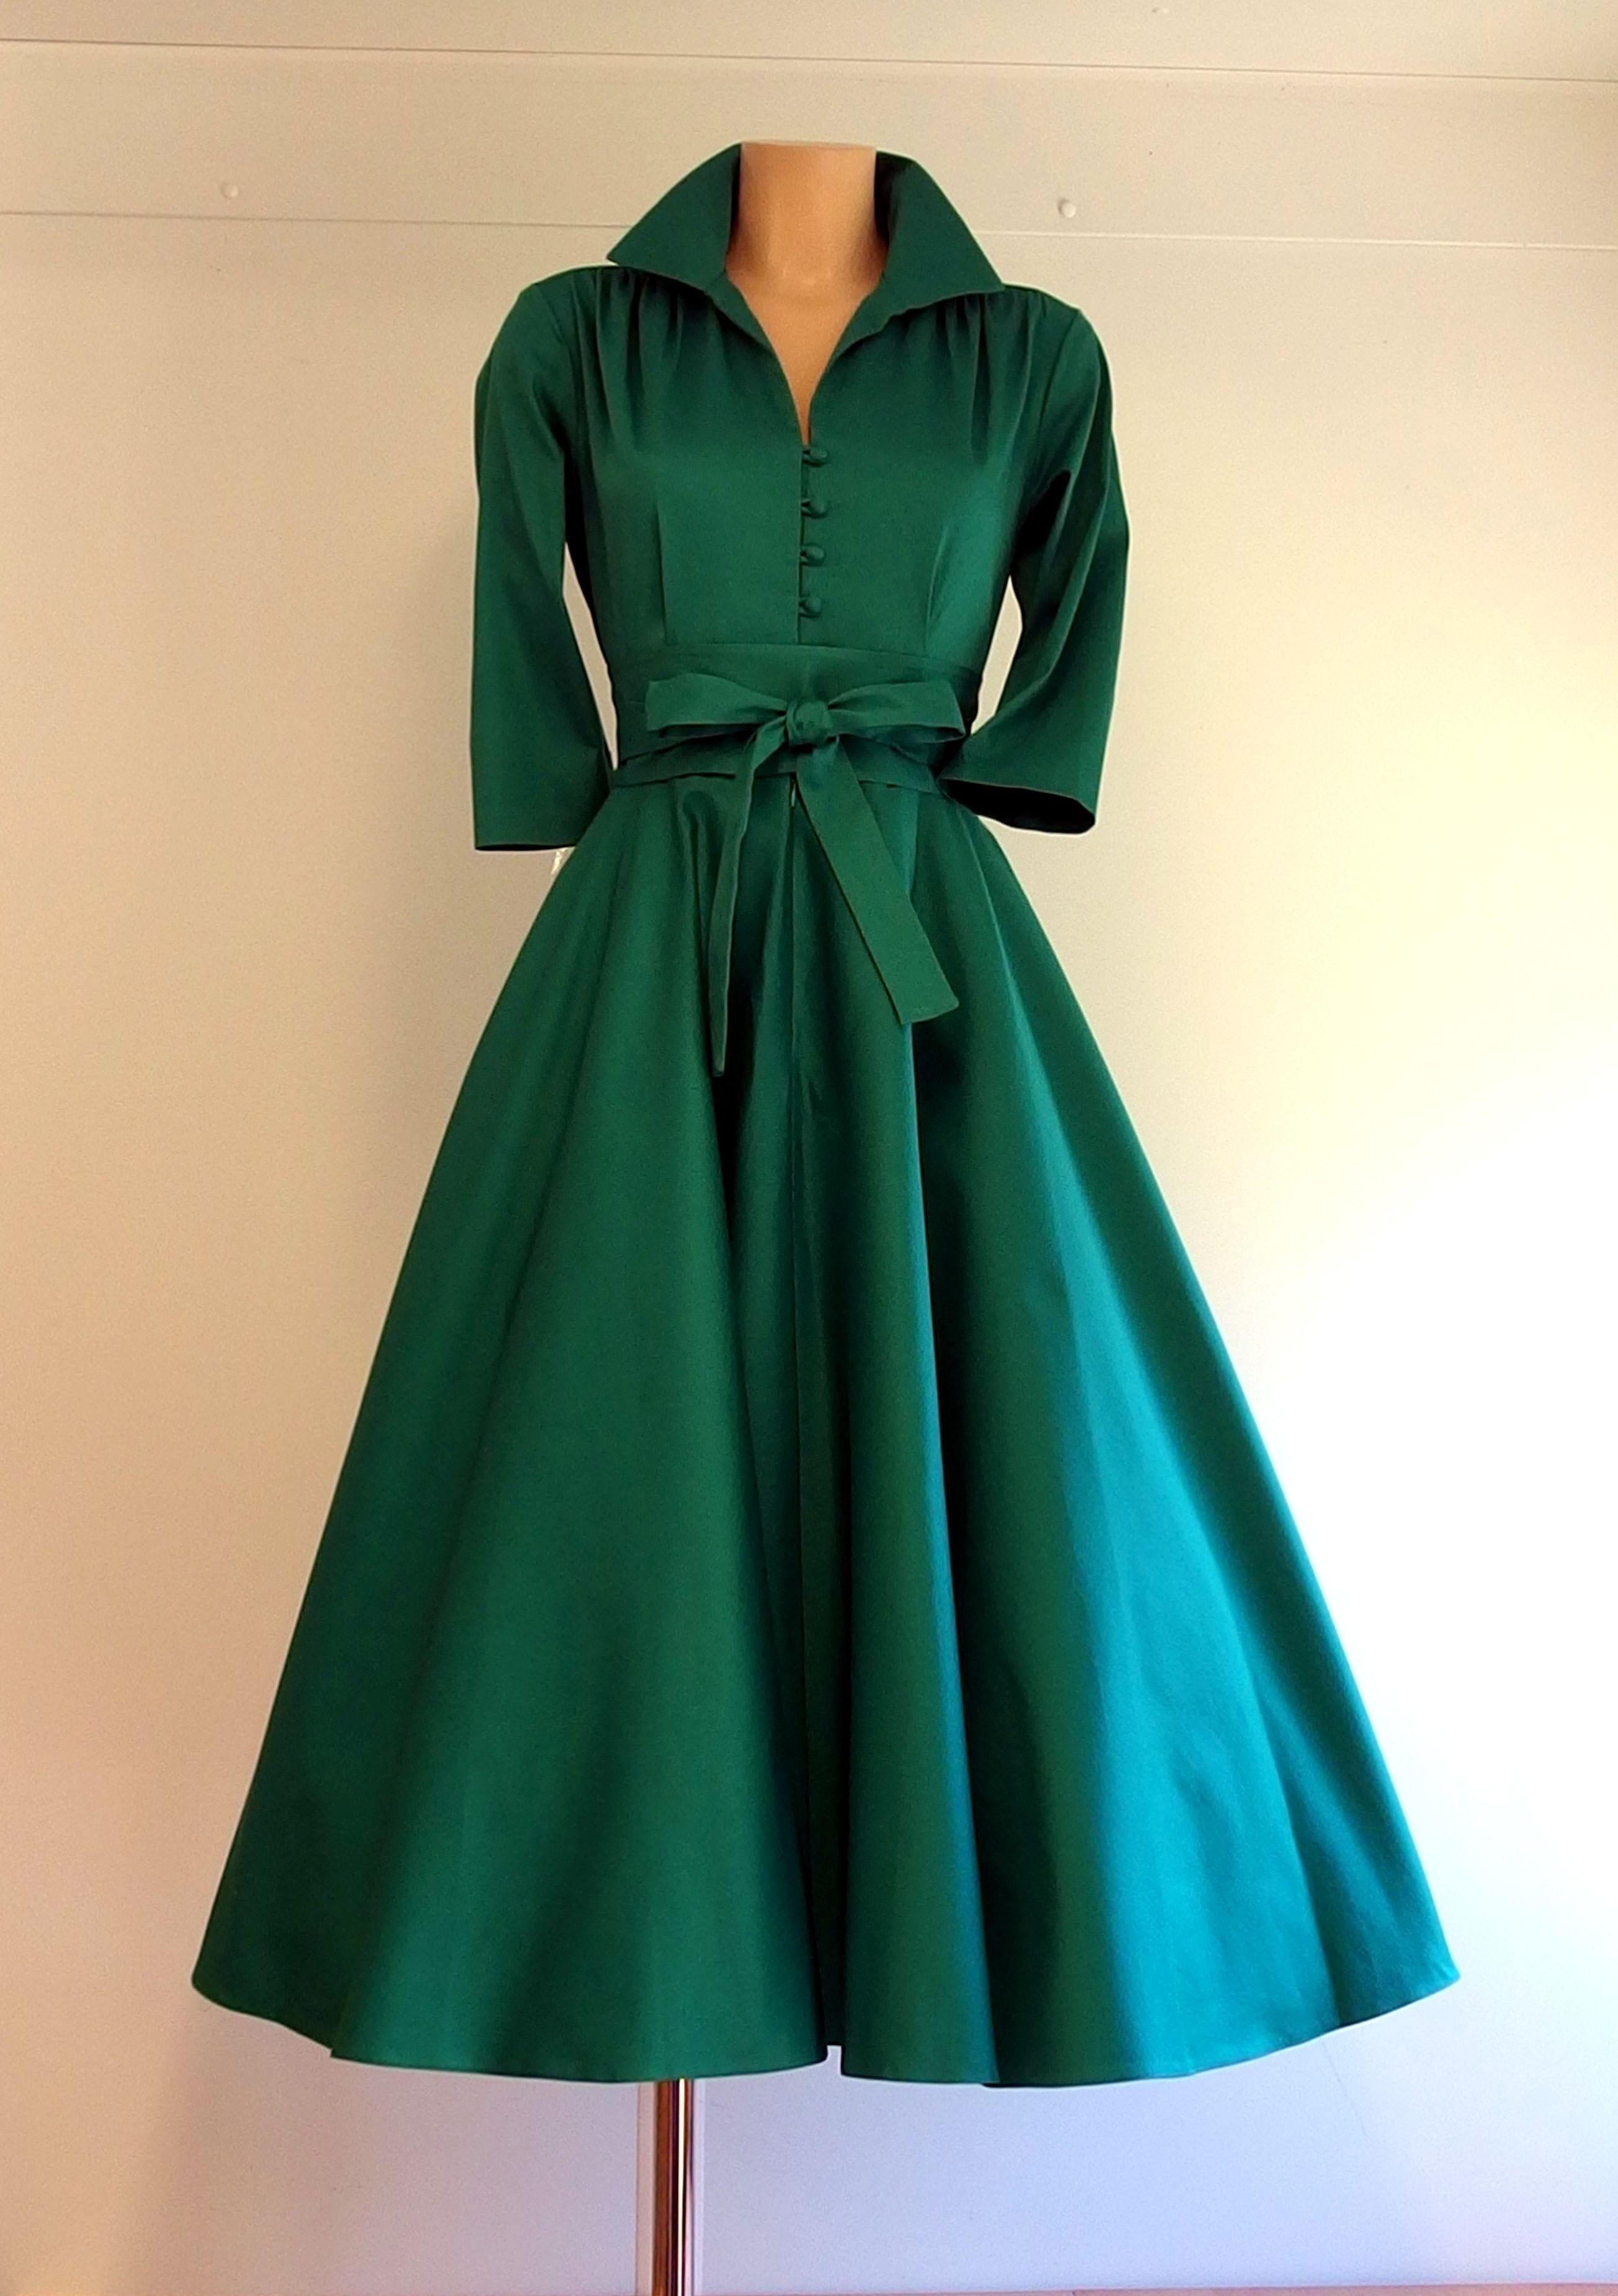 Classic Kelly Dress 3 4 Sleeve In Plain Emerald Green Suzy Hamilton Green Dress Outfit Green Wedding Dresses Simple Prom Dress [ 3701 x 2608 Pixel ]